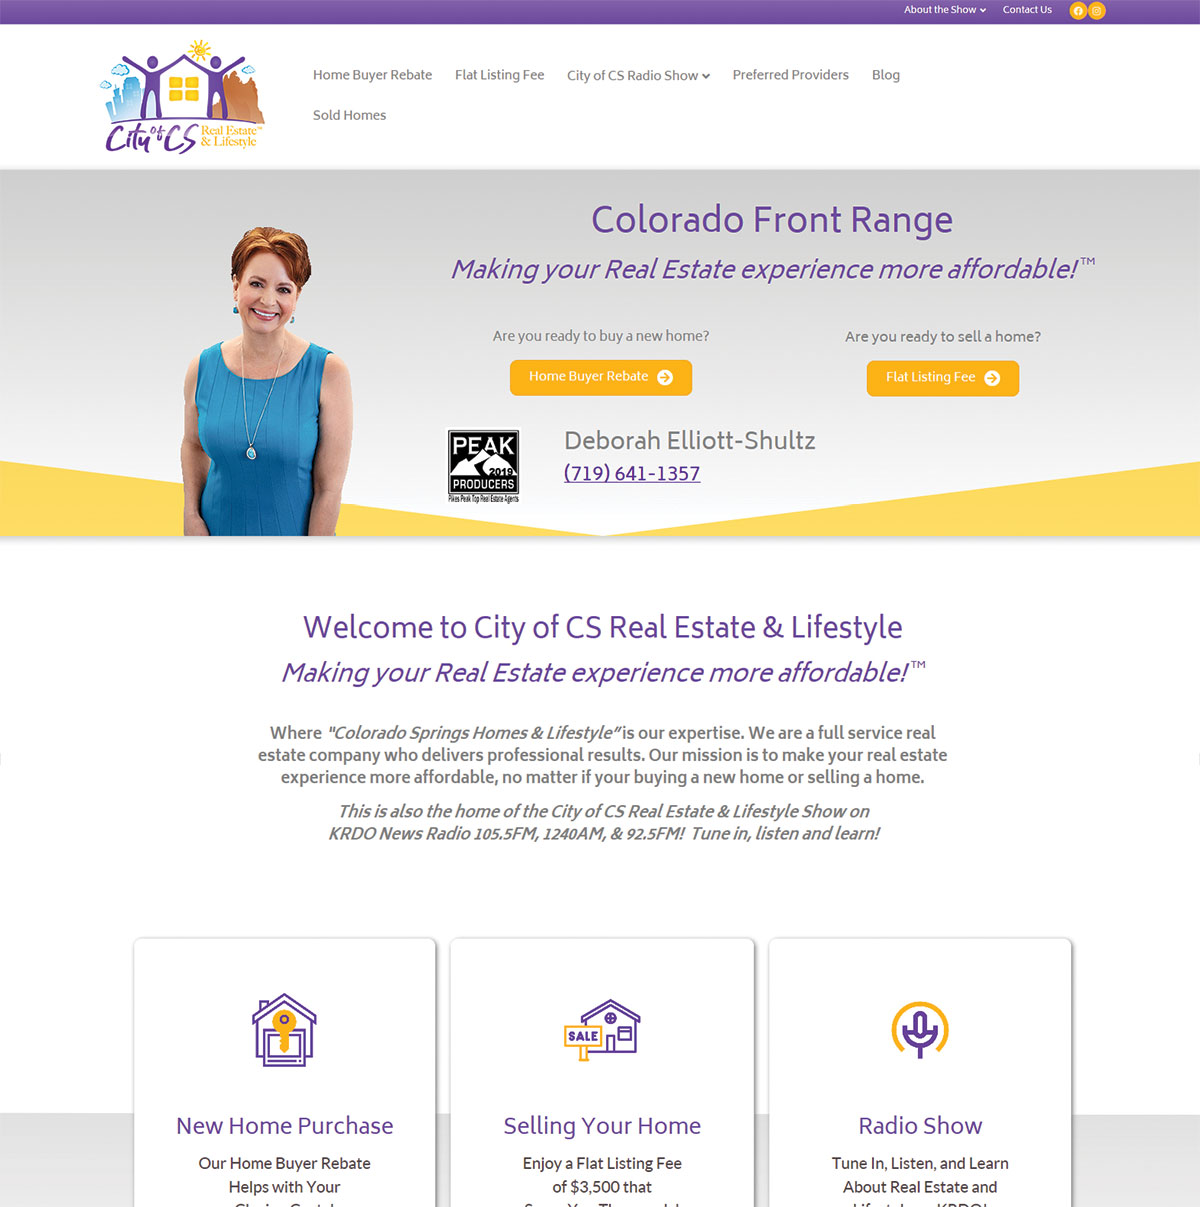 City of CS Real Estate & Lifestyle Web Site Design